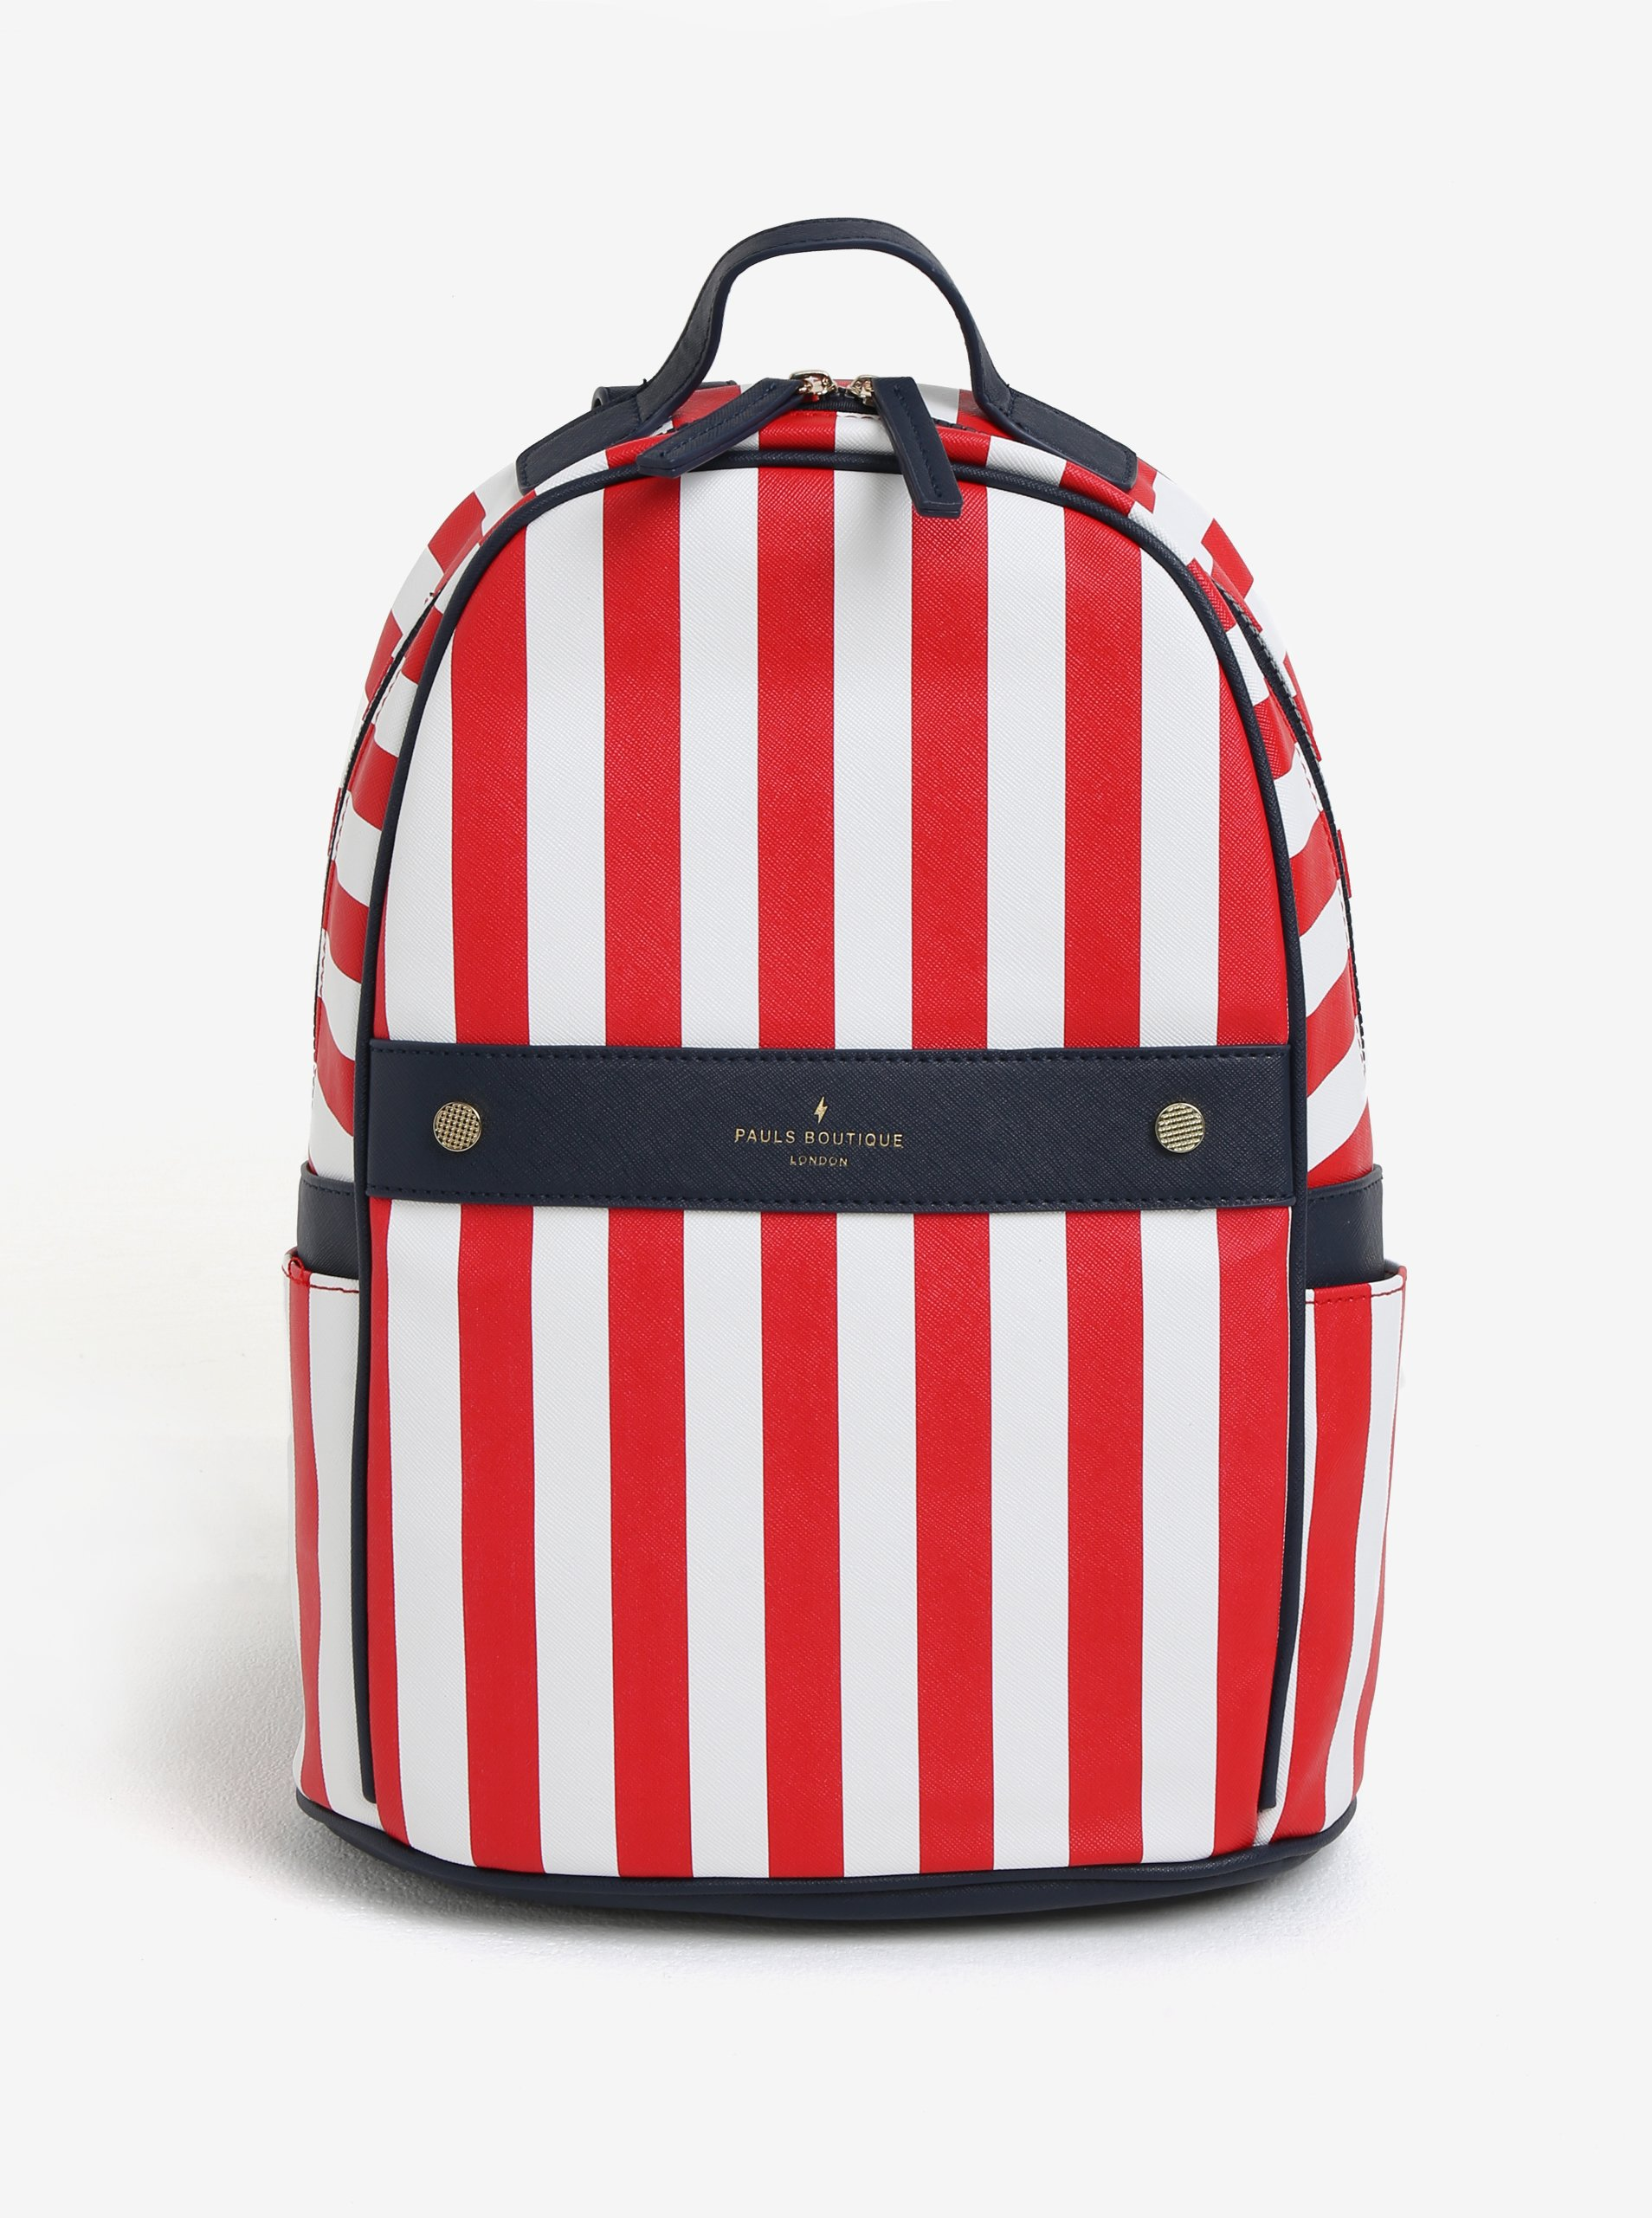 Bielo-červený pruhovaný batoh Paul's Boutique Rosa